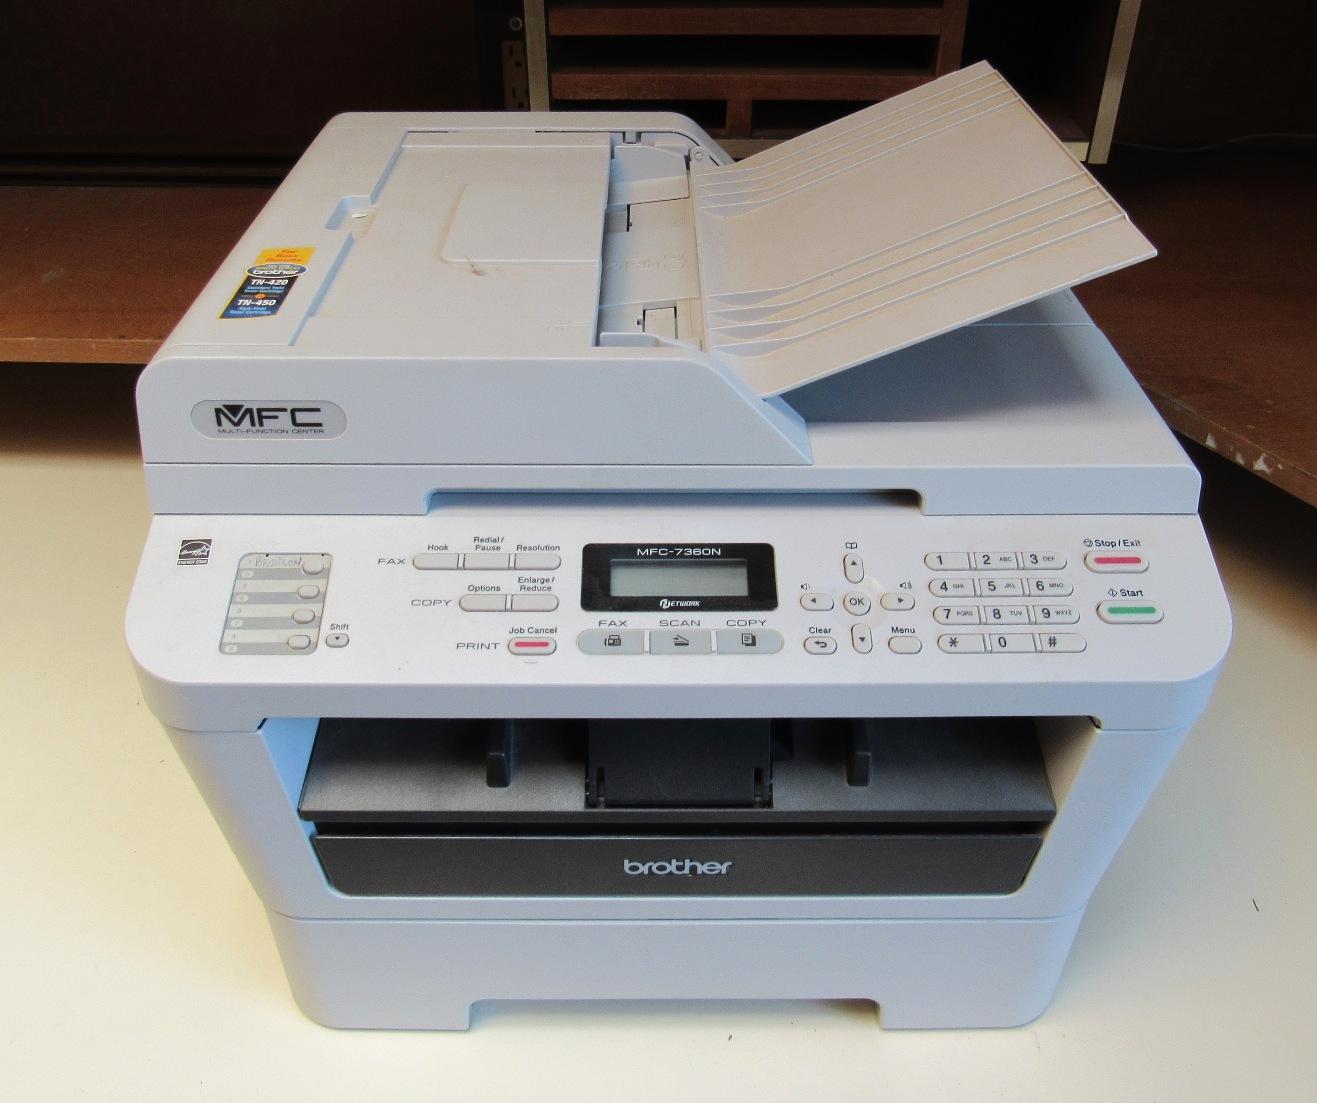 Lot 2 - Brother Mod.MFC-7360N Fax Machine